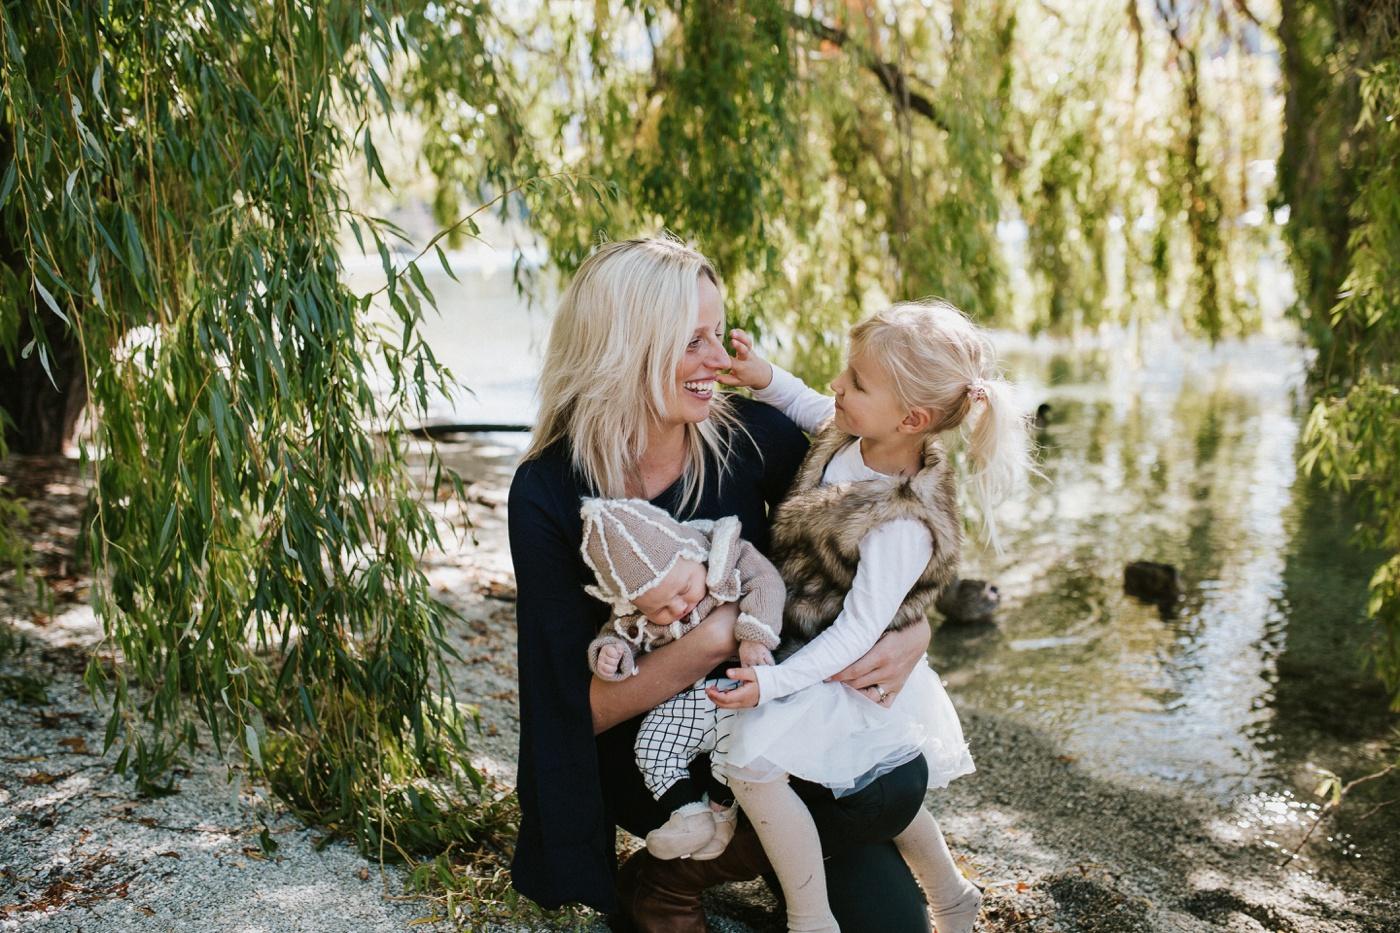 Blake-Lily-Rolig-Lekfull-Familjesession-Familjefotograf-Stockholm-Orebro_21